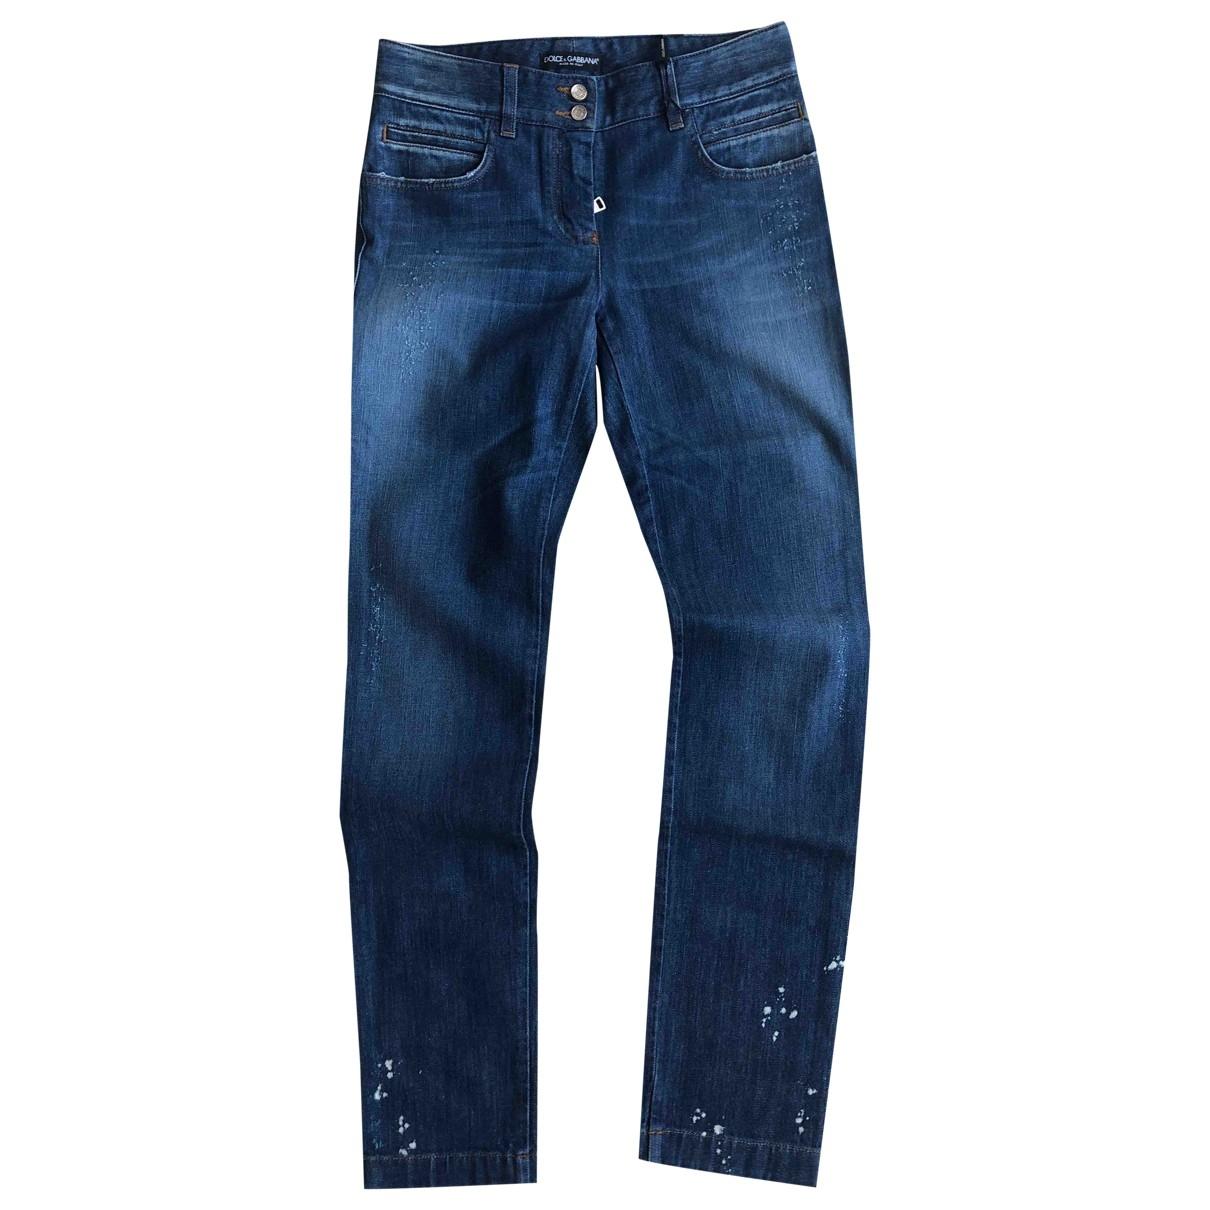 Dolce & Gabbana \N Blue Cotton - elasthane Jeans for Women 35 FR